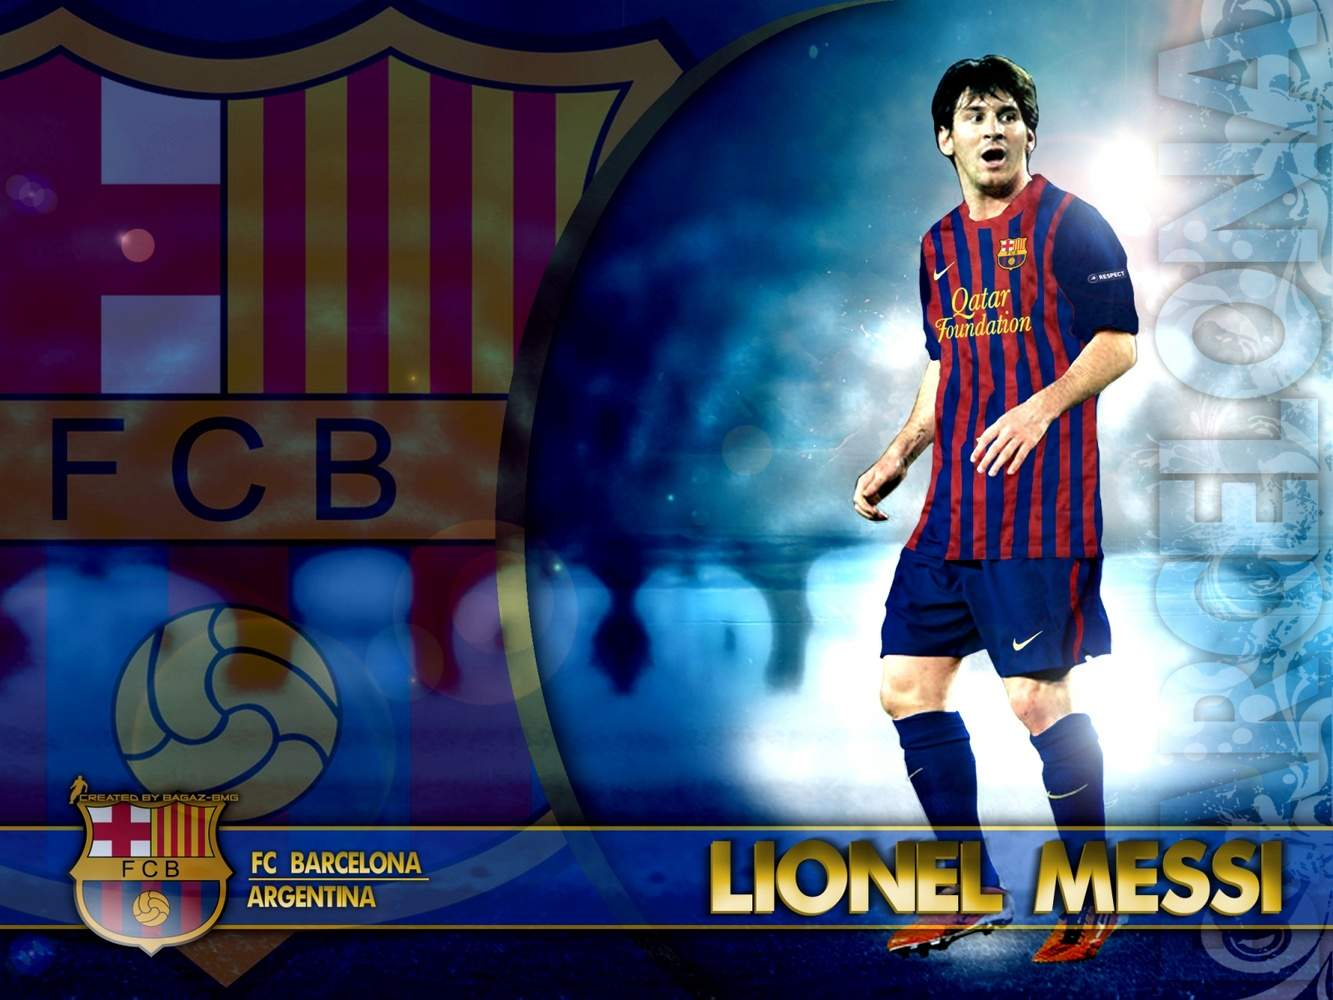 Lionel Messi 2013 Wallpaper: New Lionel Messi Wallpaper